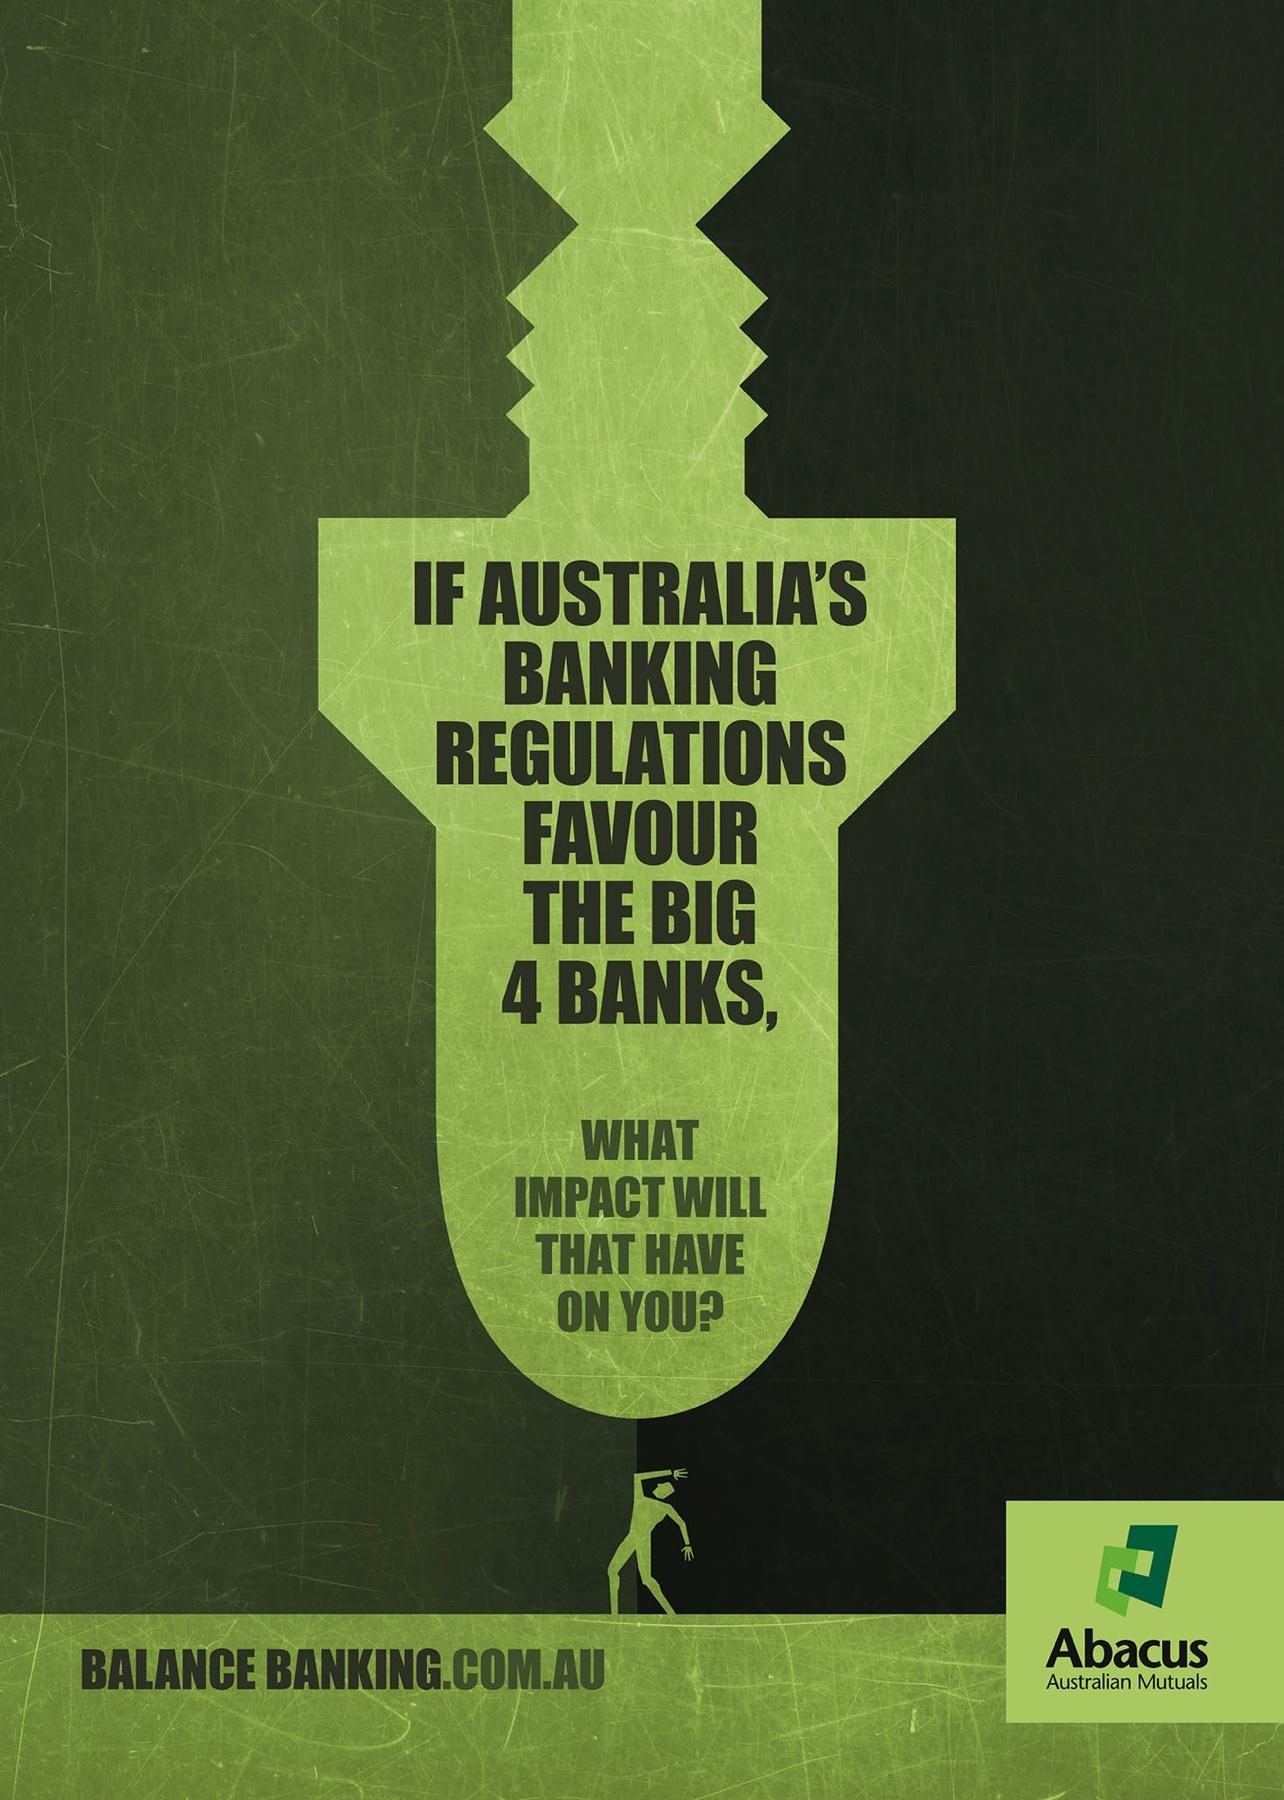 Abacus Australian Mutuals Print Ad -  Balance Banking, 2